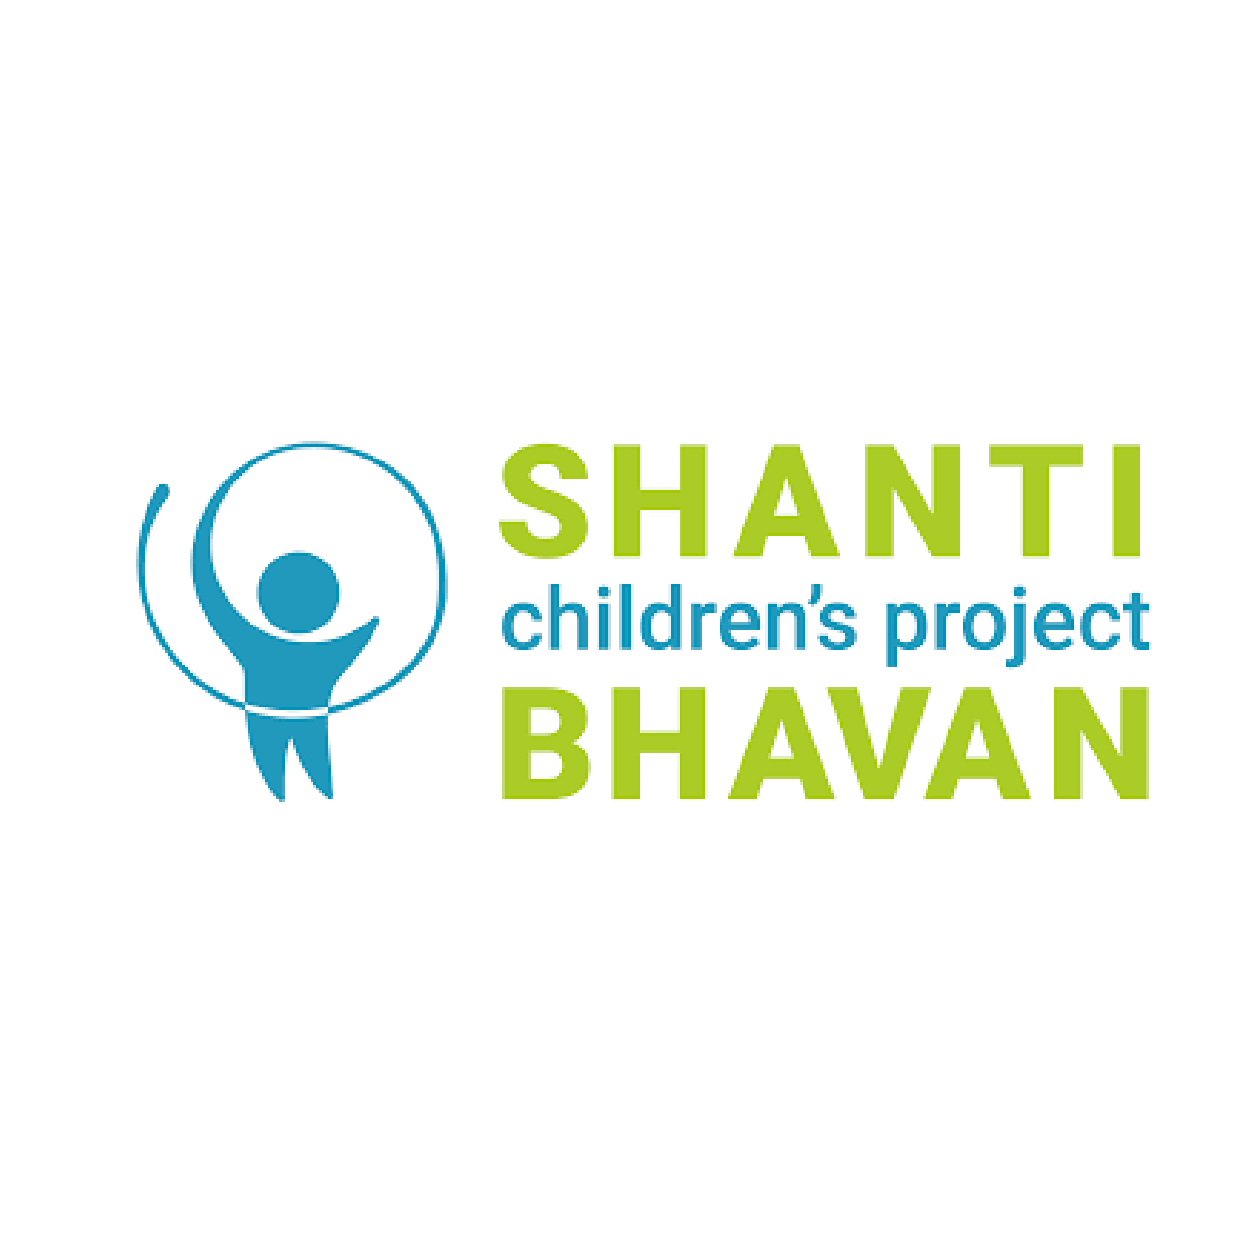 shanti bhavan-01.png